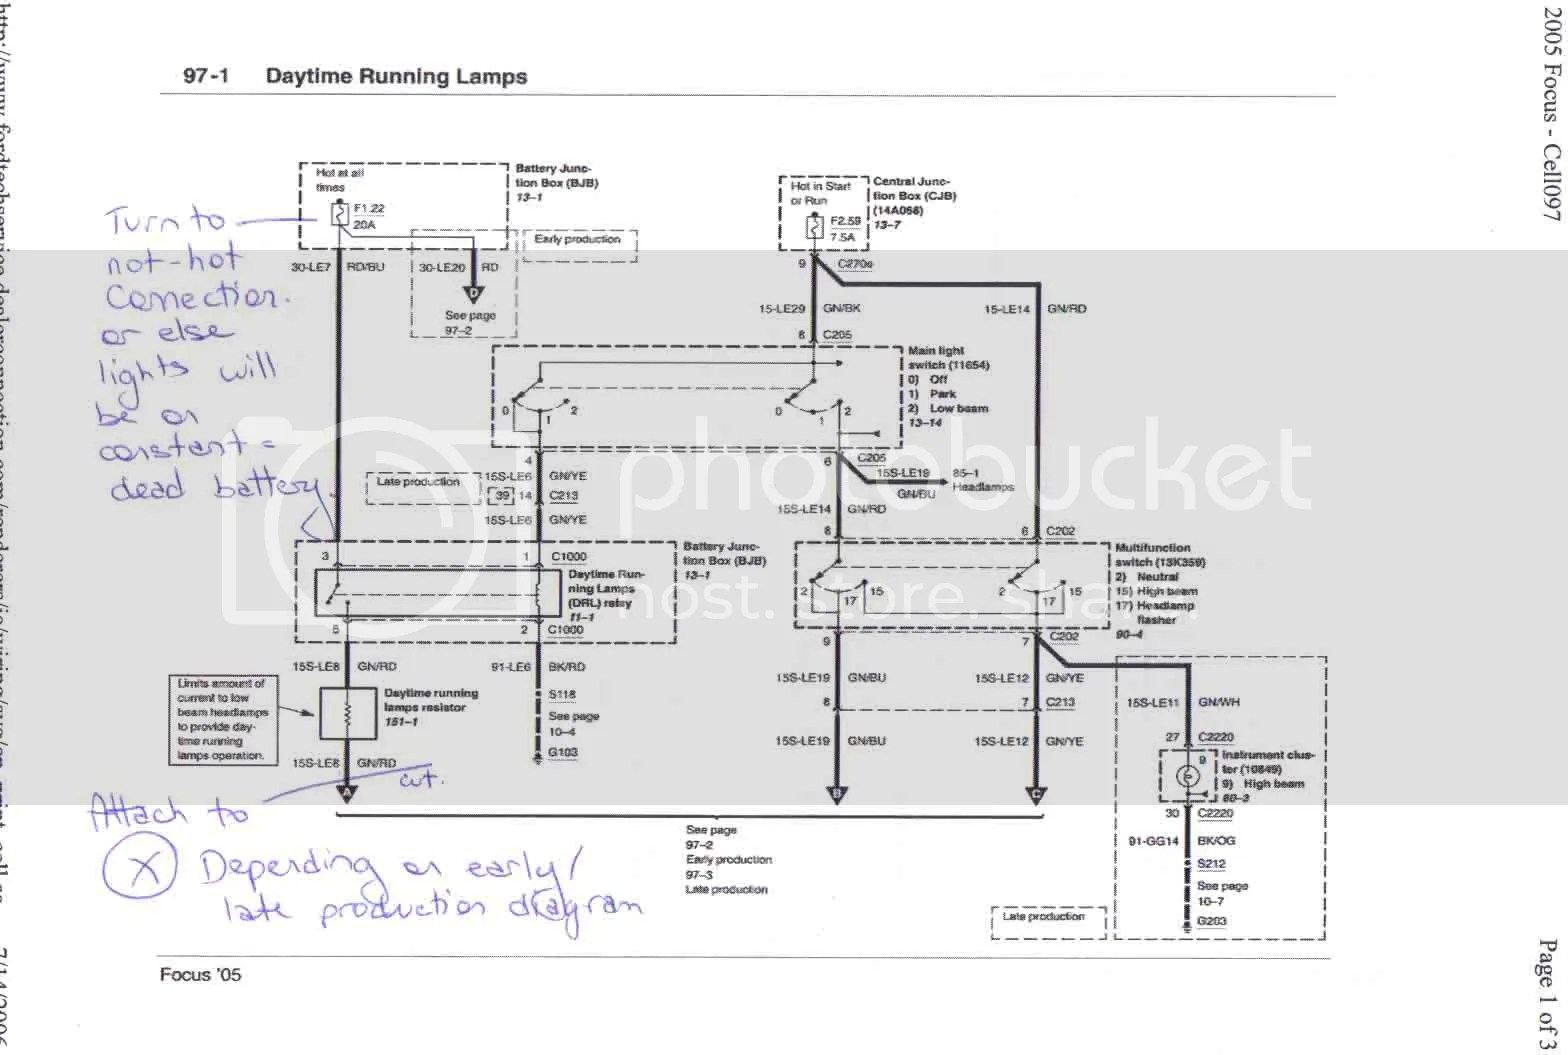 Ford Mondeo Towbar Wiring Diagram : 33 Wiring Diagram